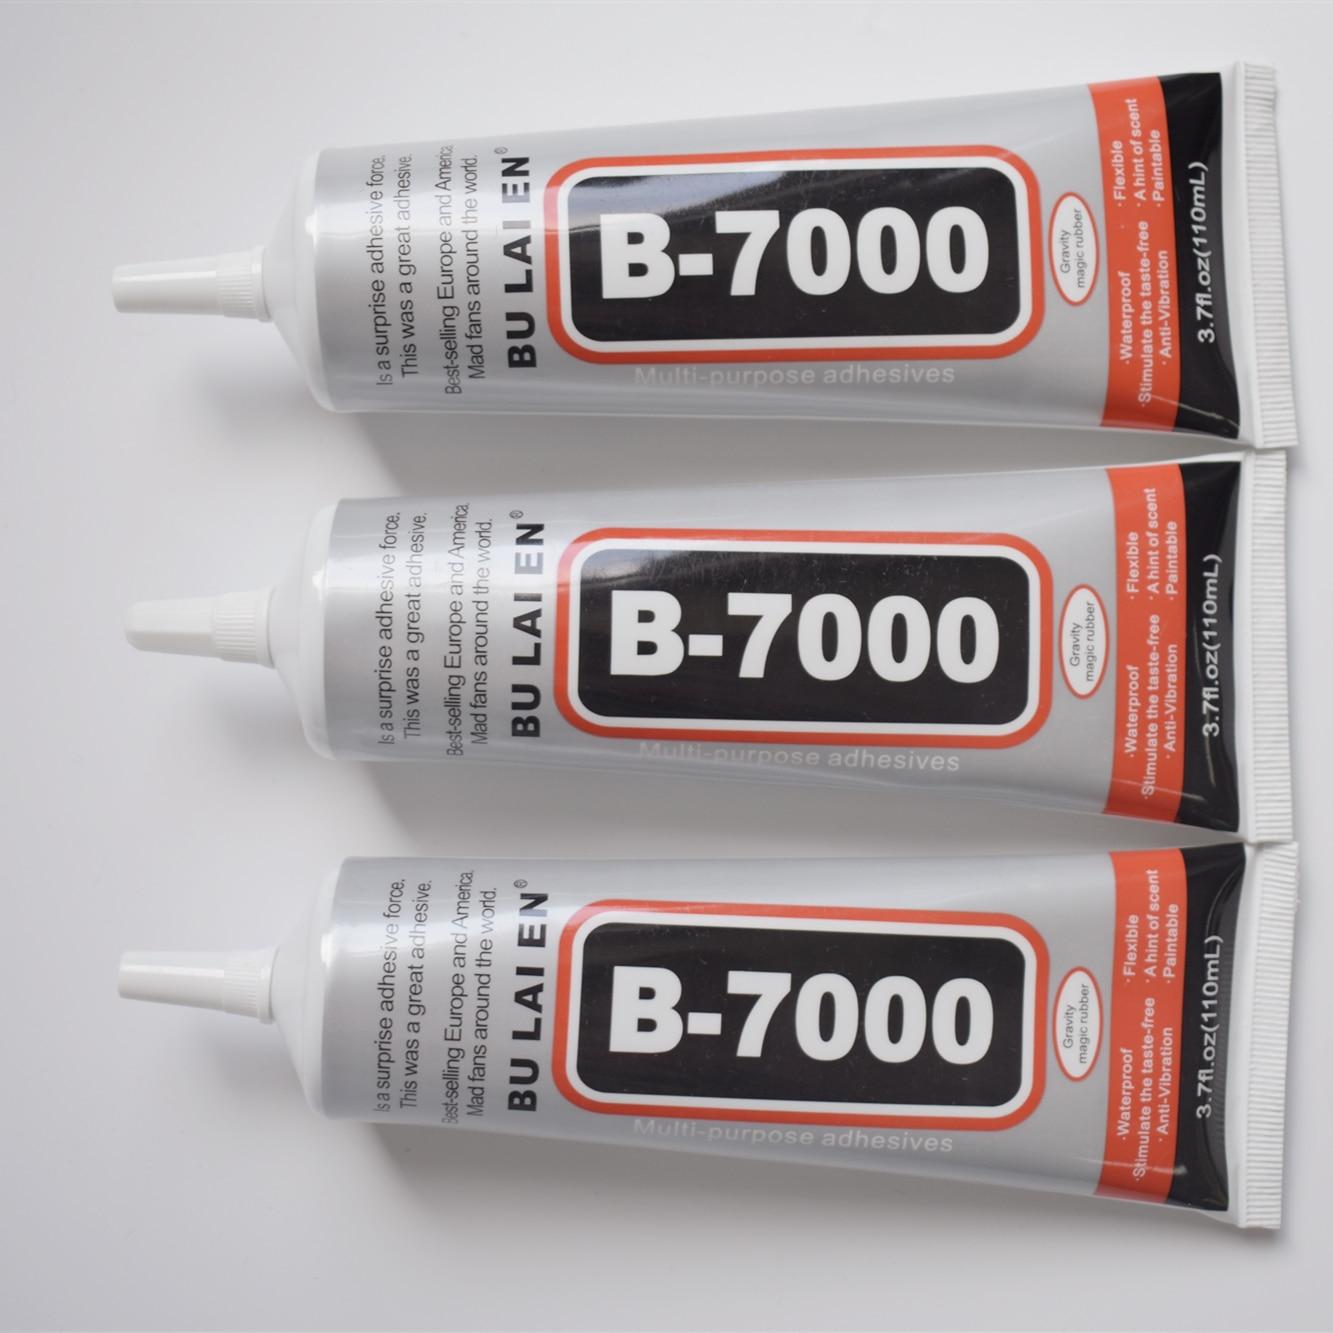 pegamento-b-7000-b7000-para-reparacion-de-telefono-movil-adhesivo-multiusos-de-resina-epoxi-para-reparacion-de-pantalla-tactil-lcd-super-glue-b-110-b7000-7000-ml